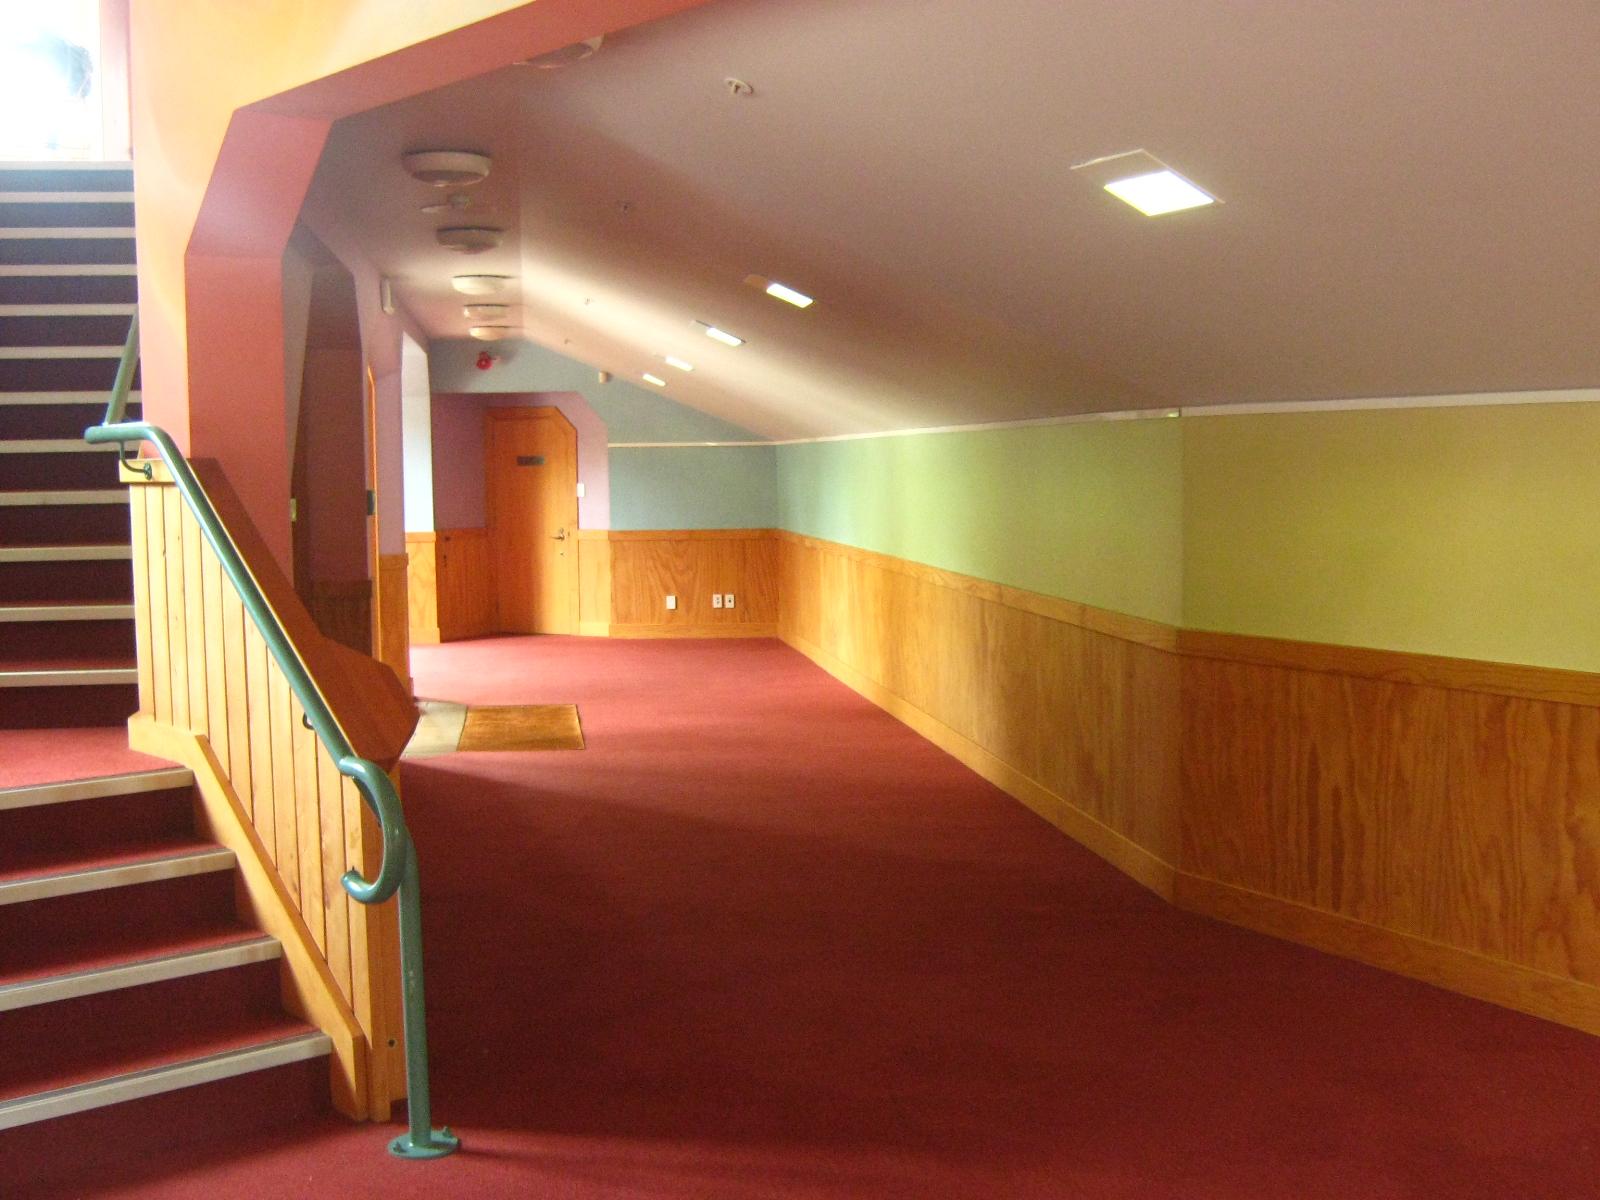 Auditorium in New Zealandfinished 002.JPG